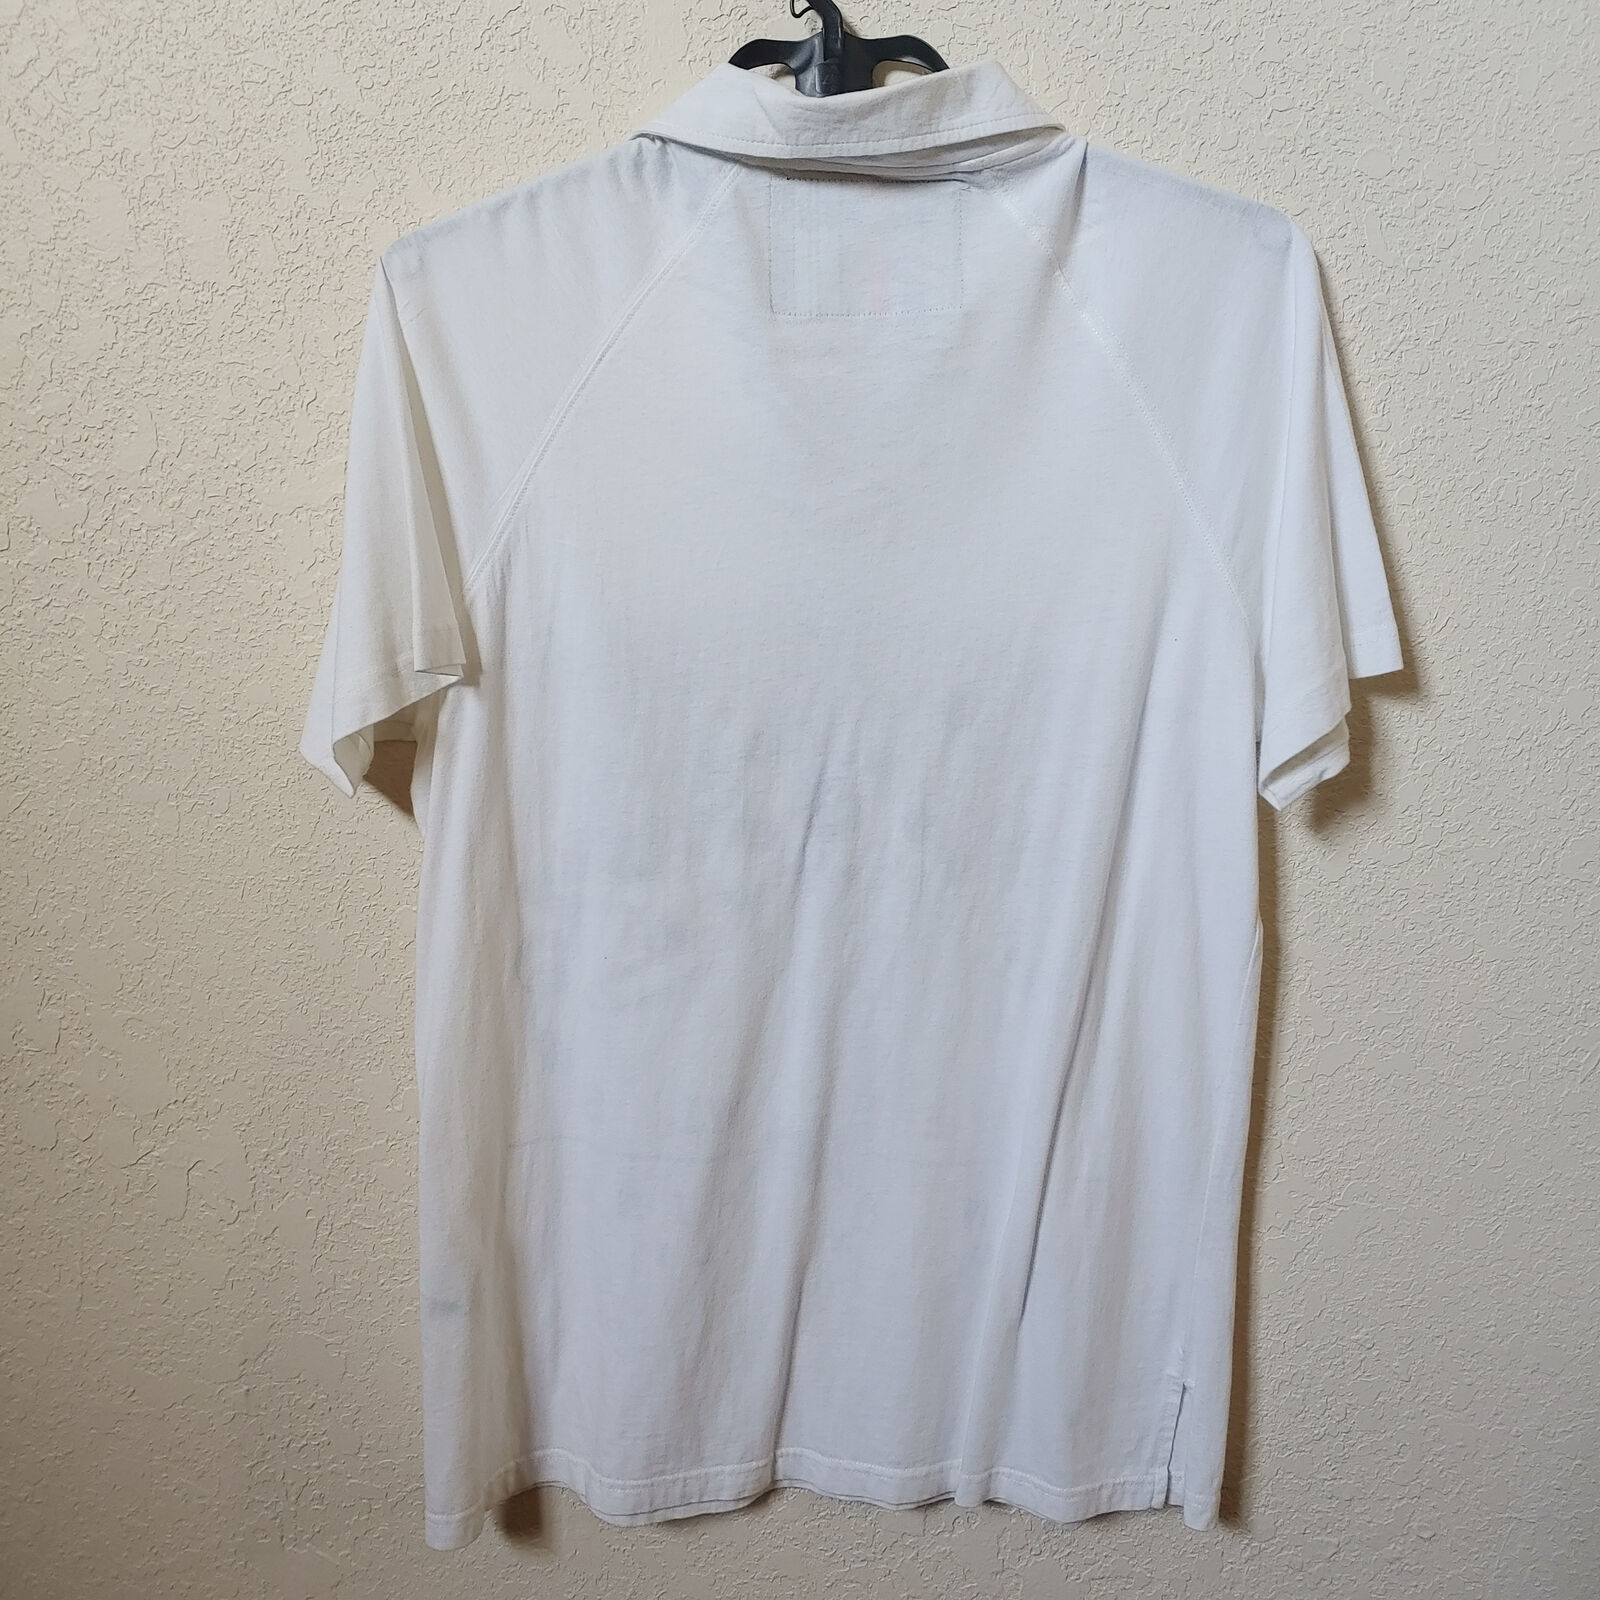 Energie | Mens Casual Short sleeve shirt - image 3